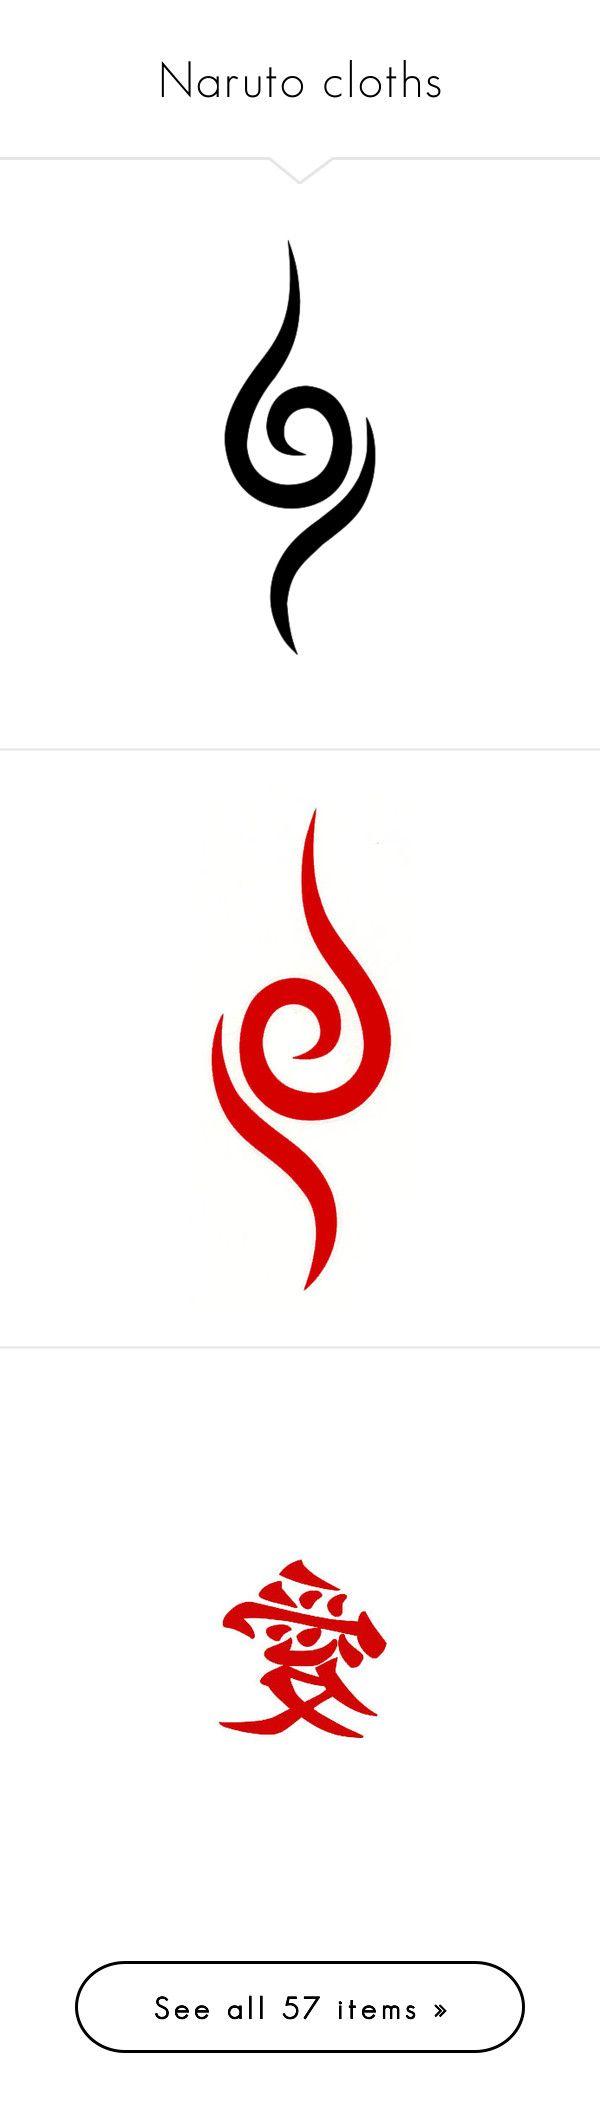 The 25 best simbolo naruto ideas on pinterest cl uchiha naruto cloths by lgdalaten liked on polyvore featuring naruto anime backgrounds buycottarizona